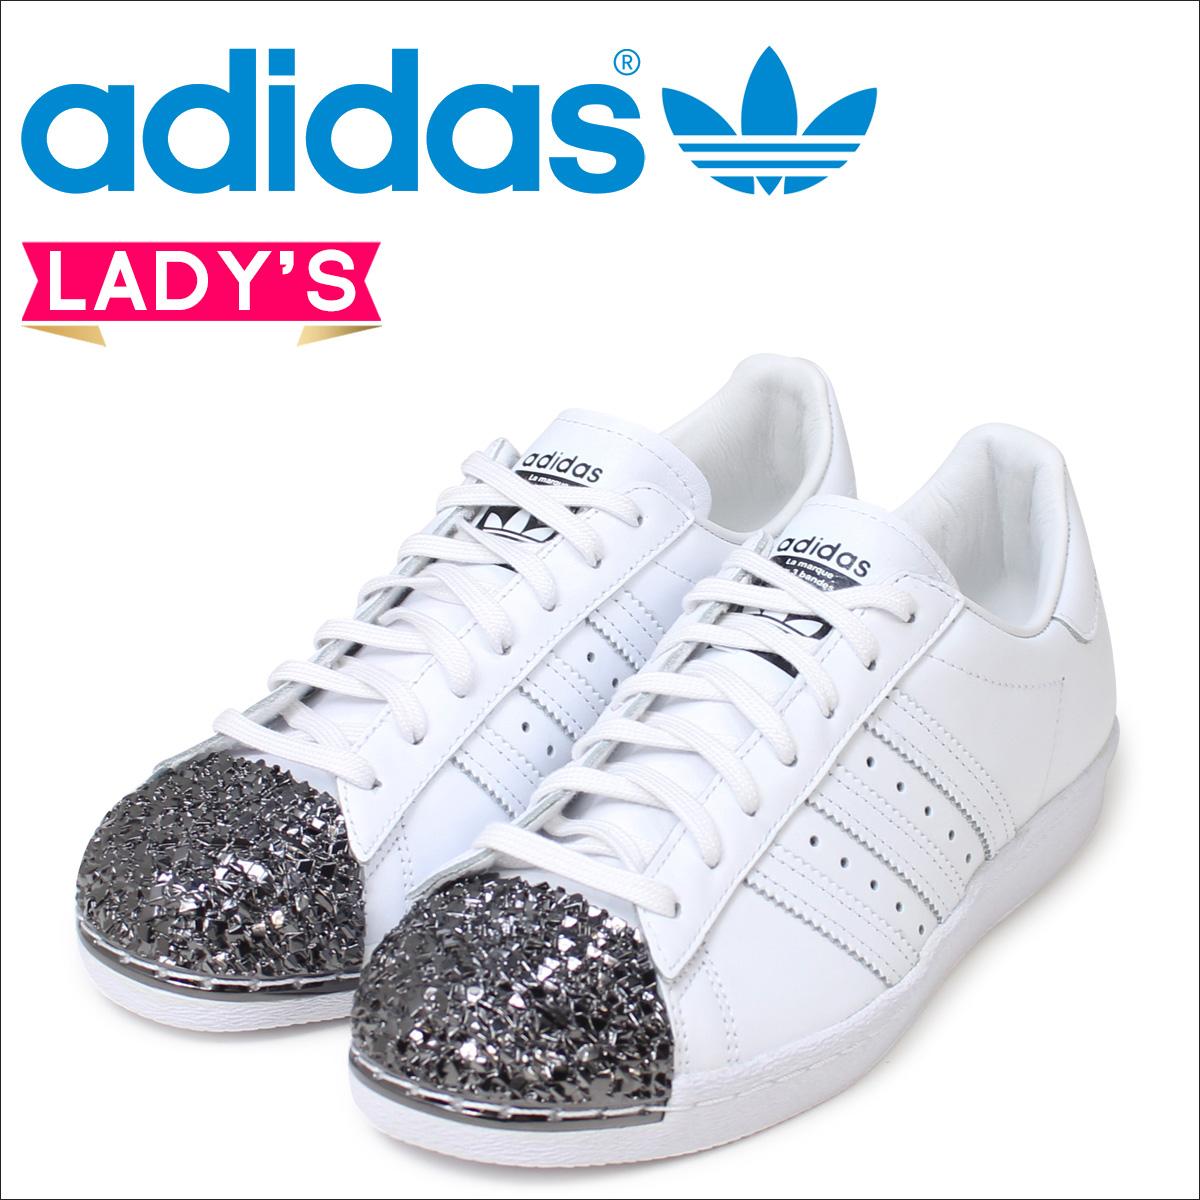 adidas originals superstar 80s womens white